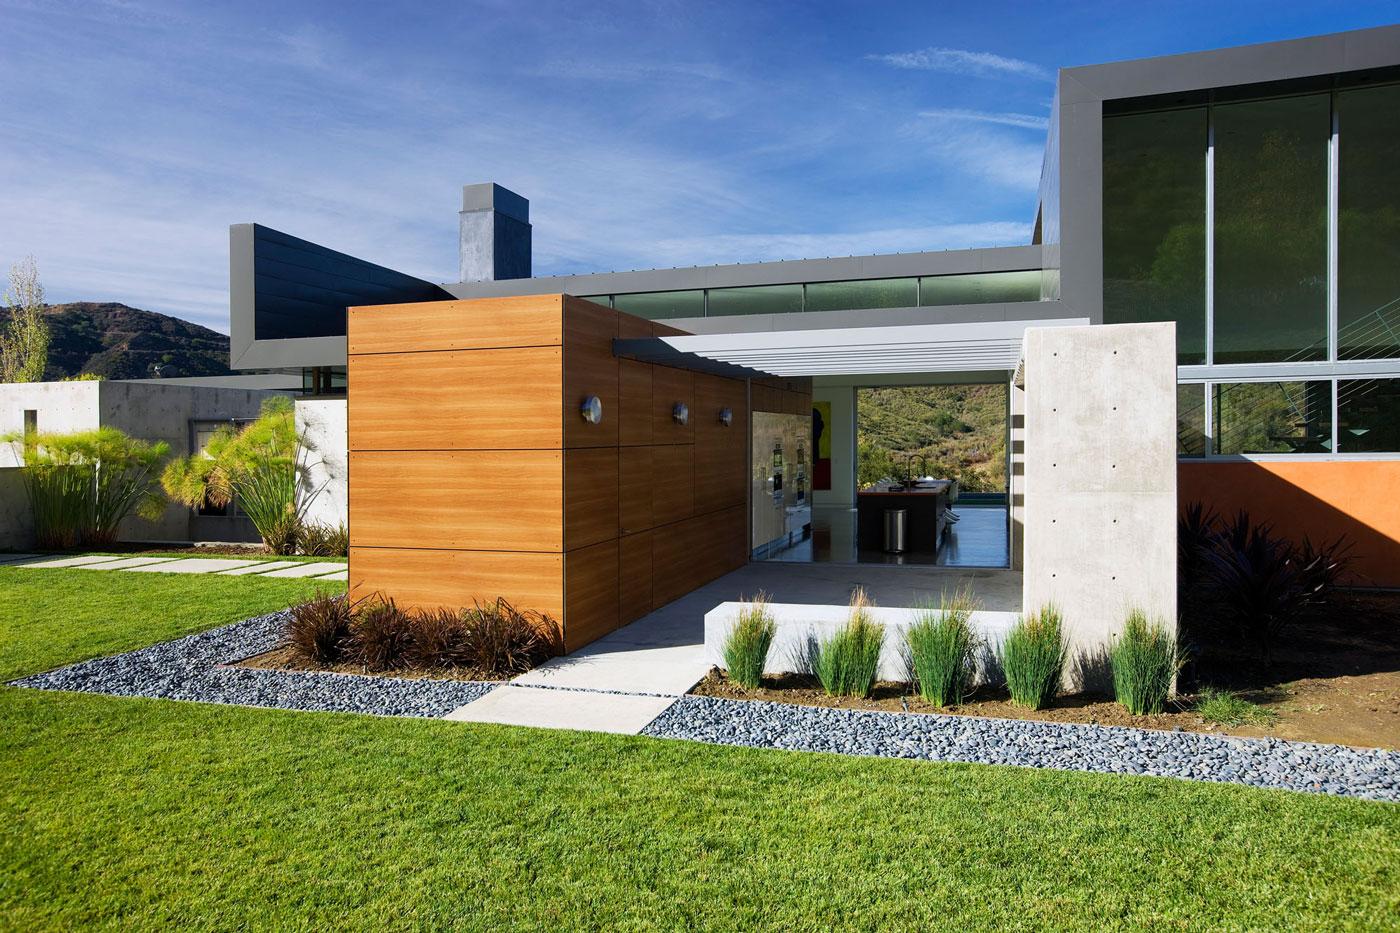 Lima Residenz Los Angeles contemporary architektur